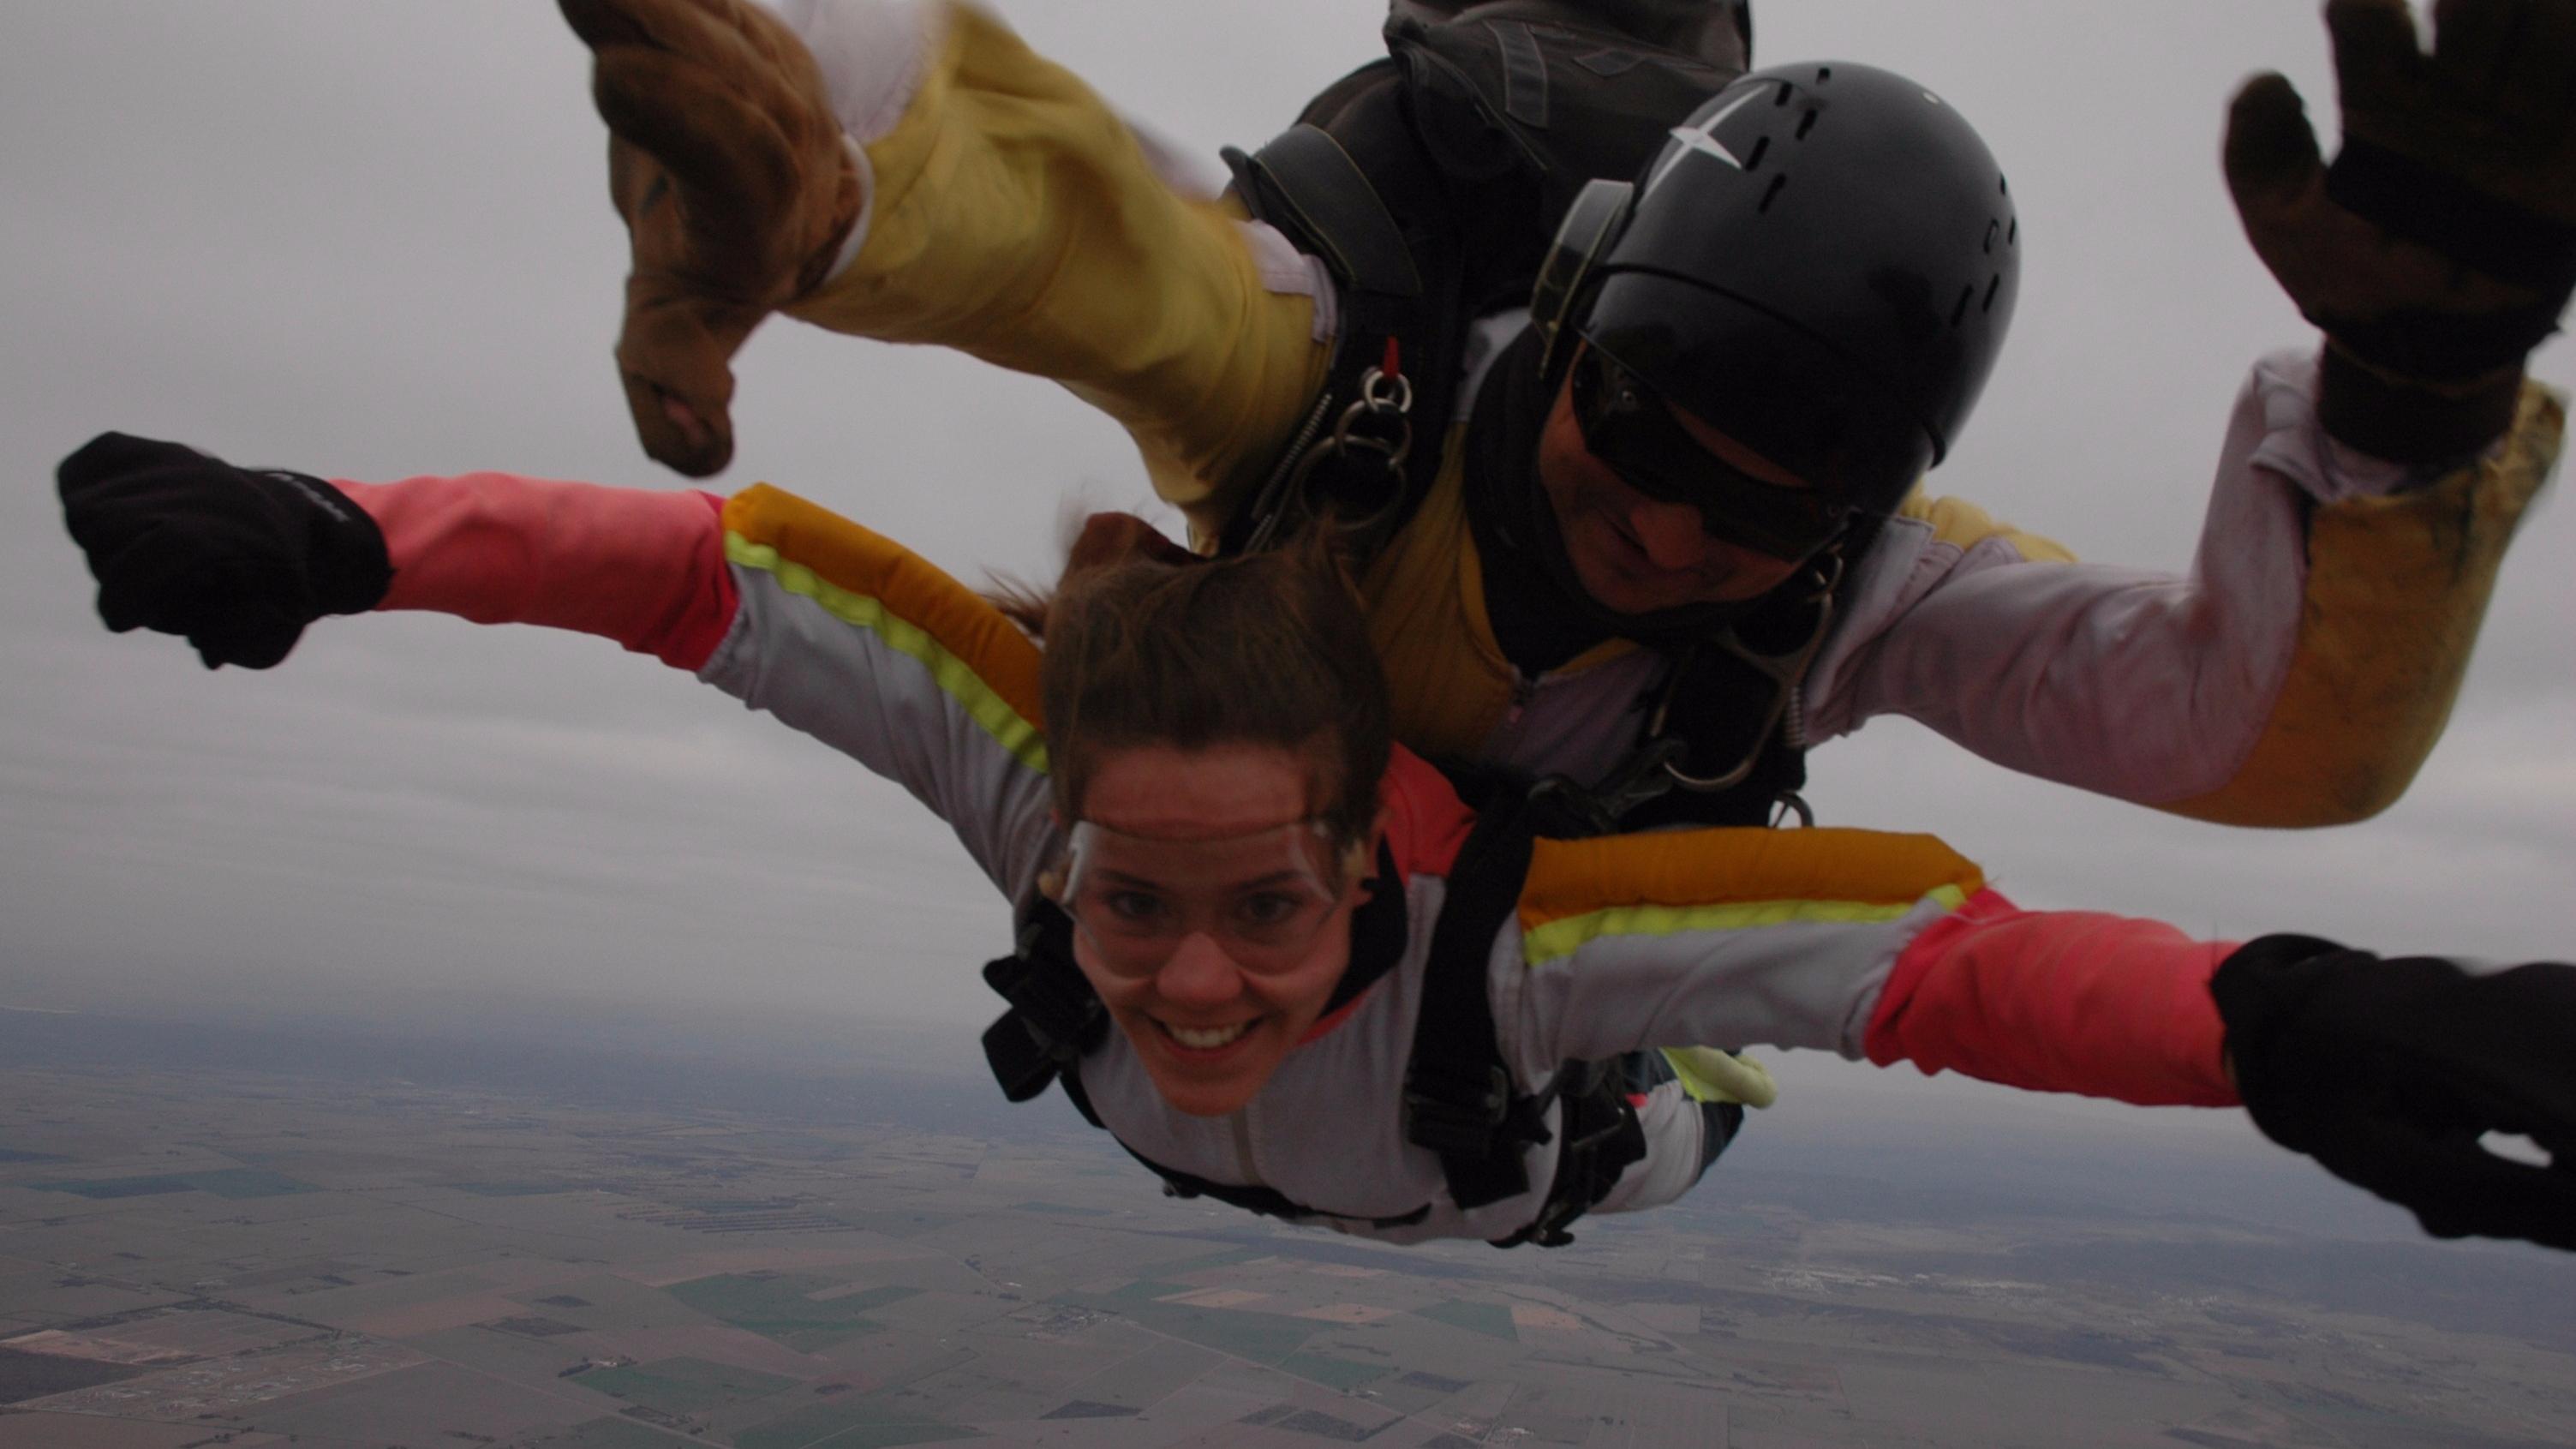 tandem_sky-diving_jump.jpg